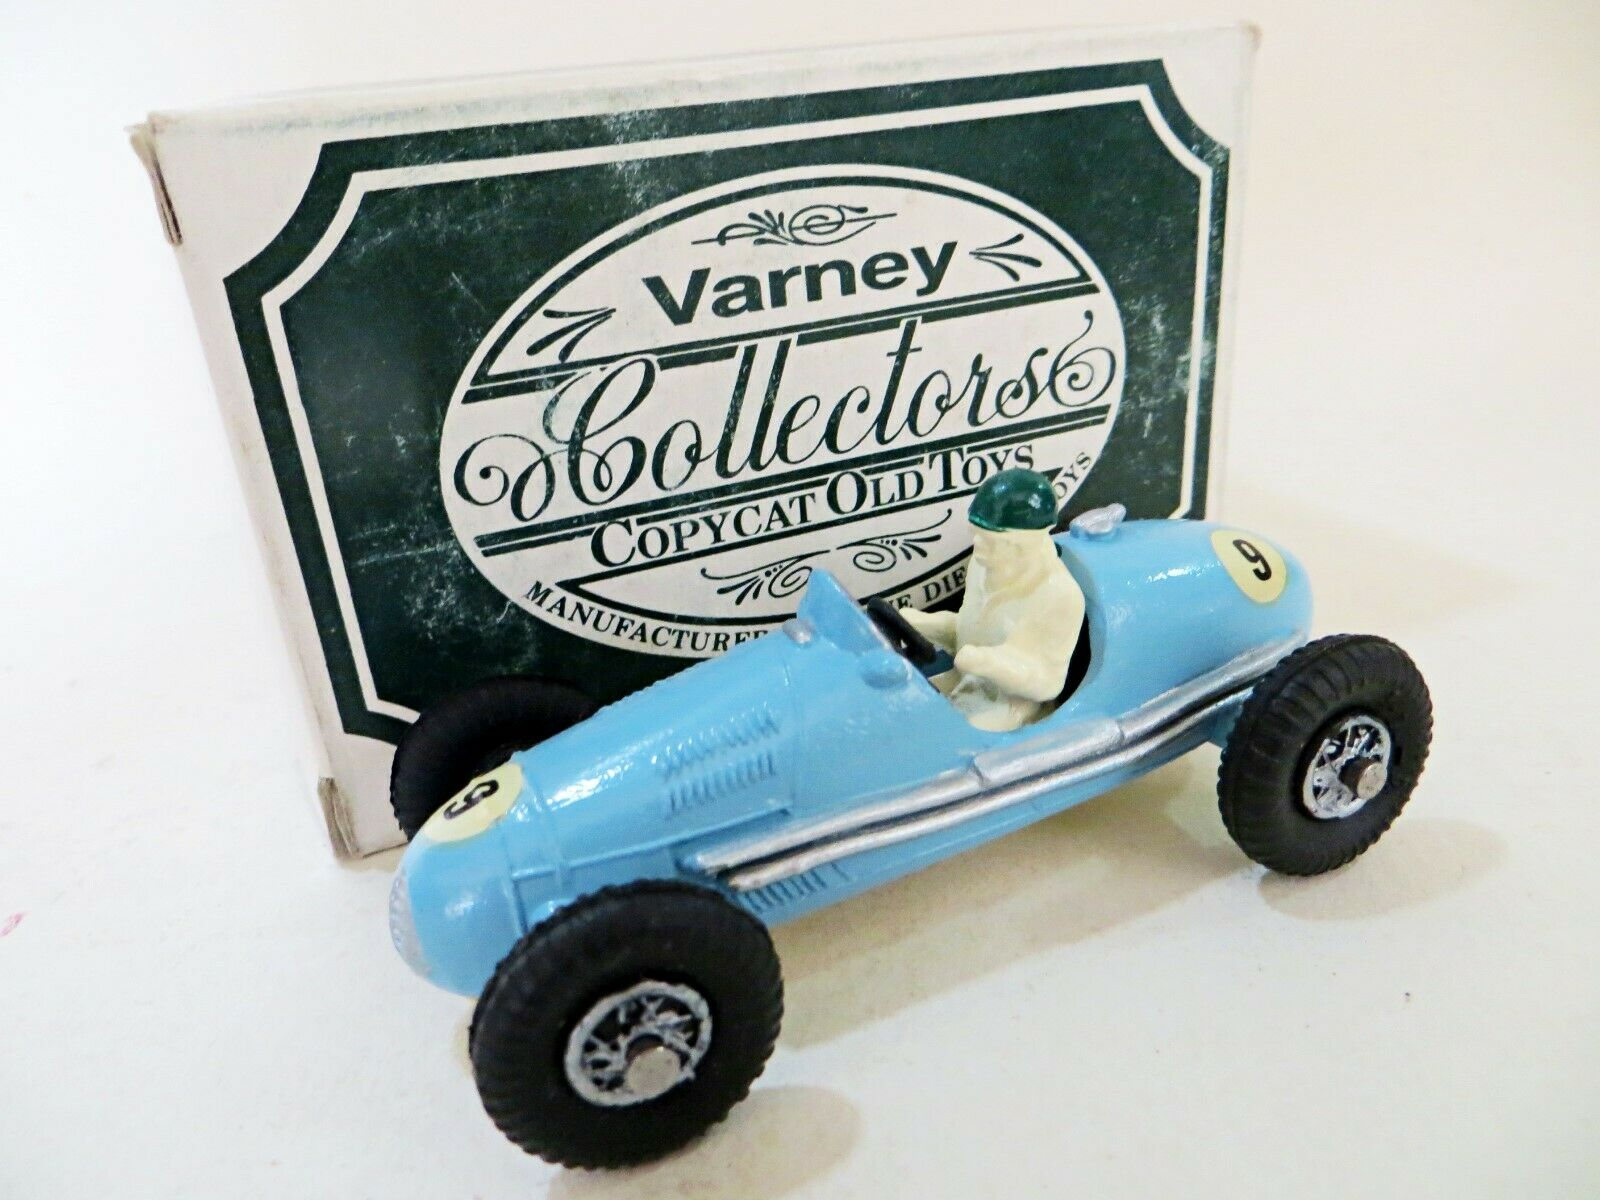 VARNEY COLLECTORS COPYCAT OLD TOYS 'GORDINI RACING CAR' BOXED. CRESCENT COPY